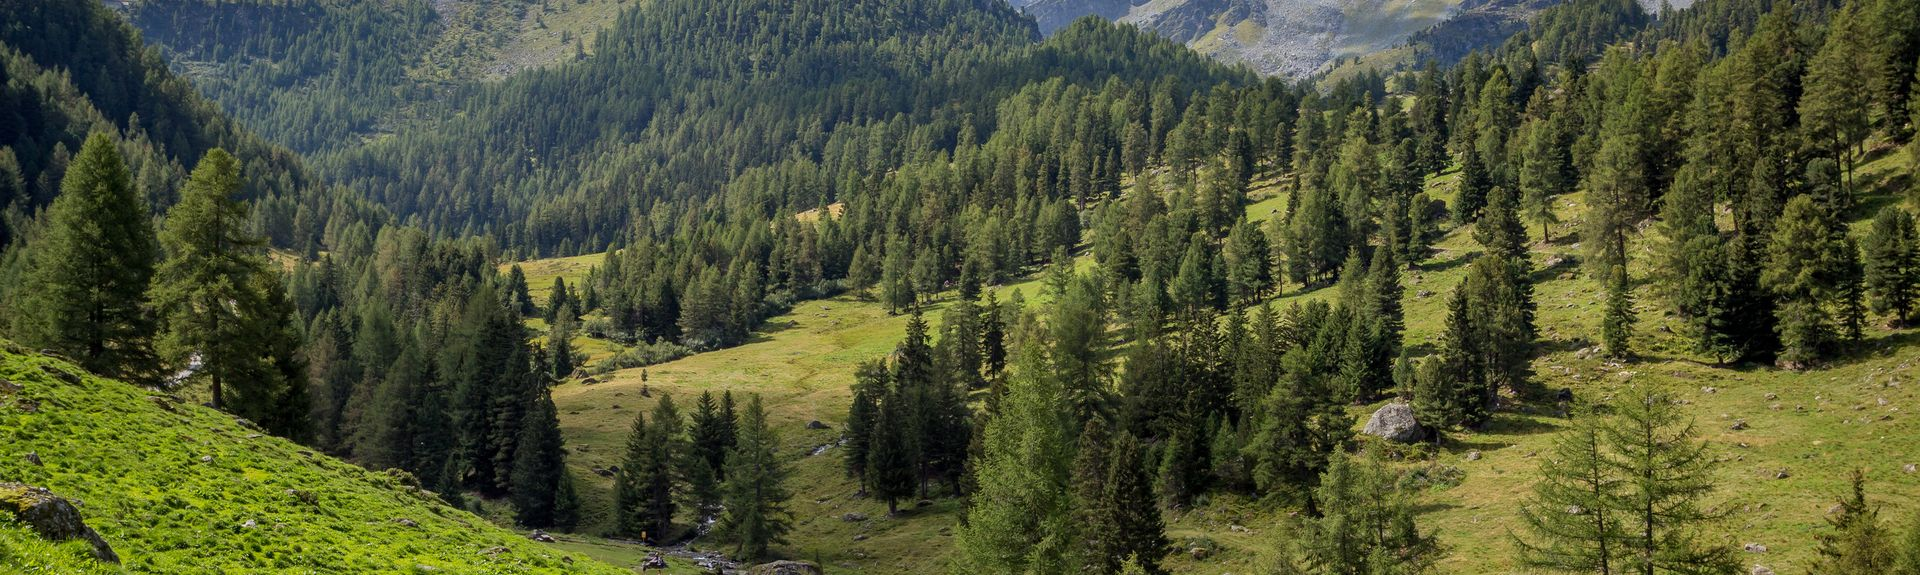 Haute-Nendaz, Nendaz, Wallis, Zwitserland